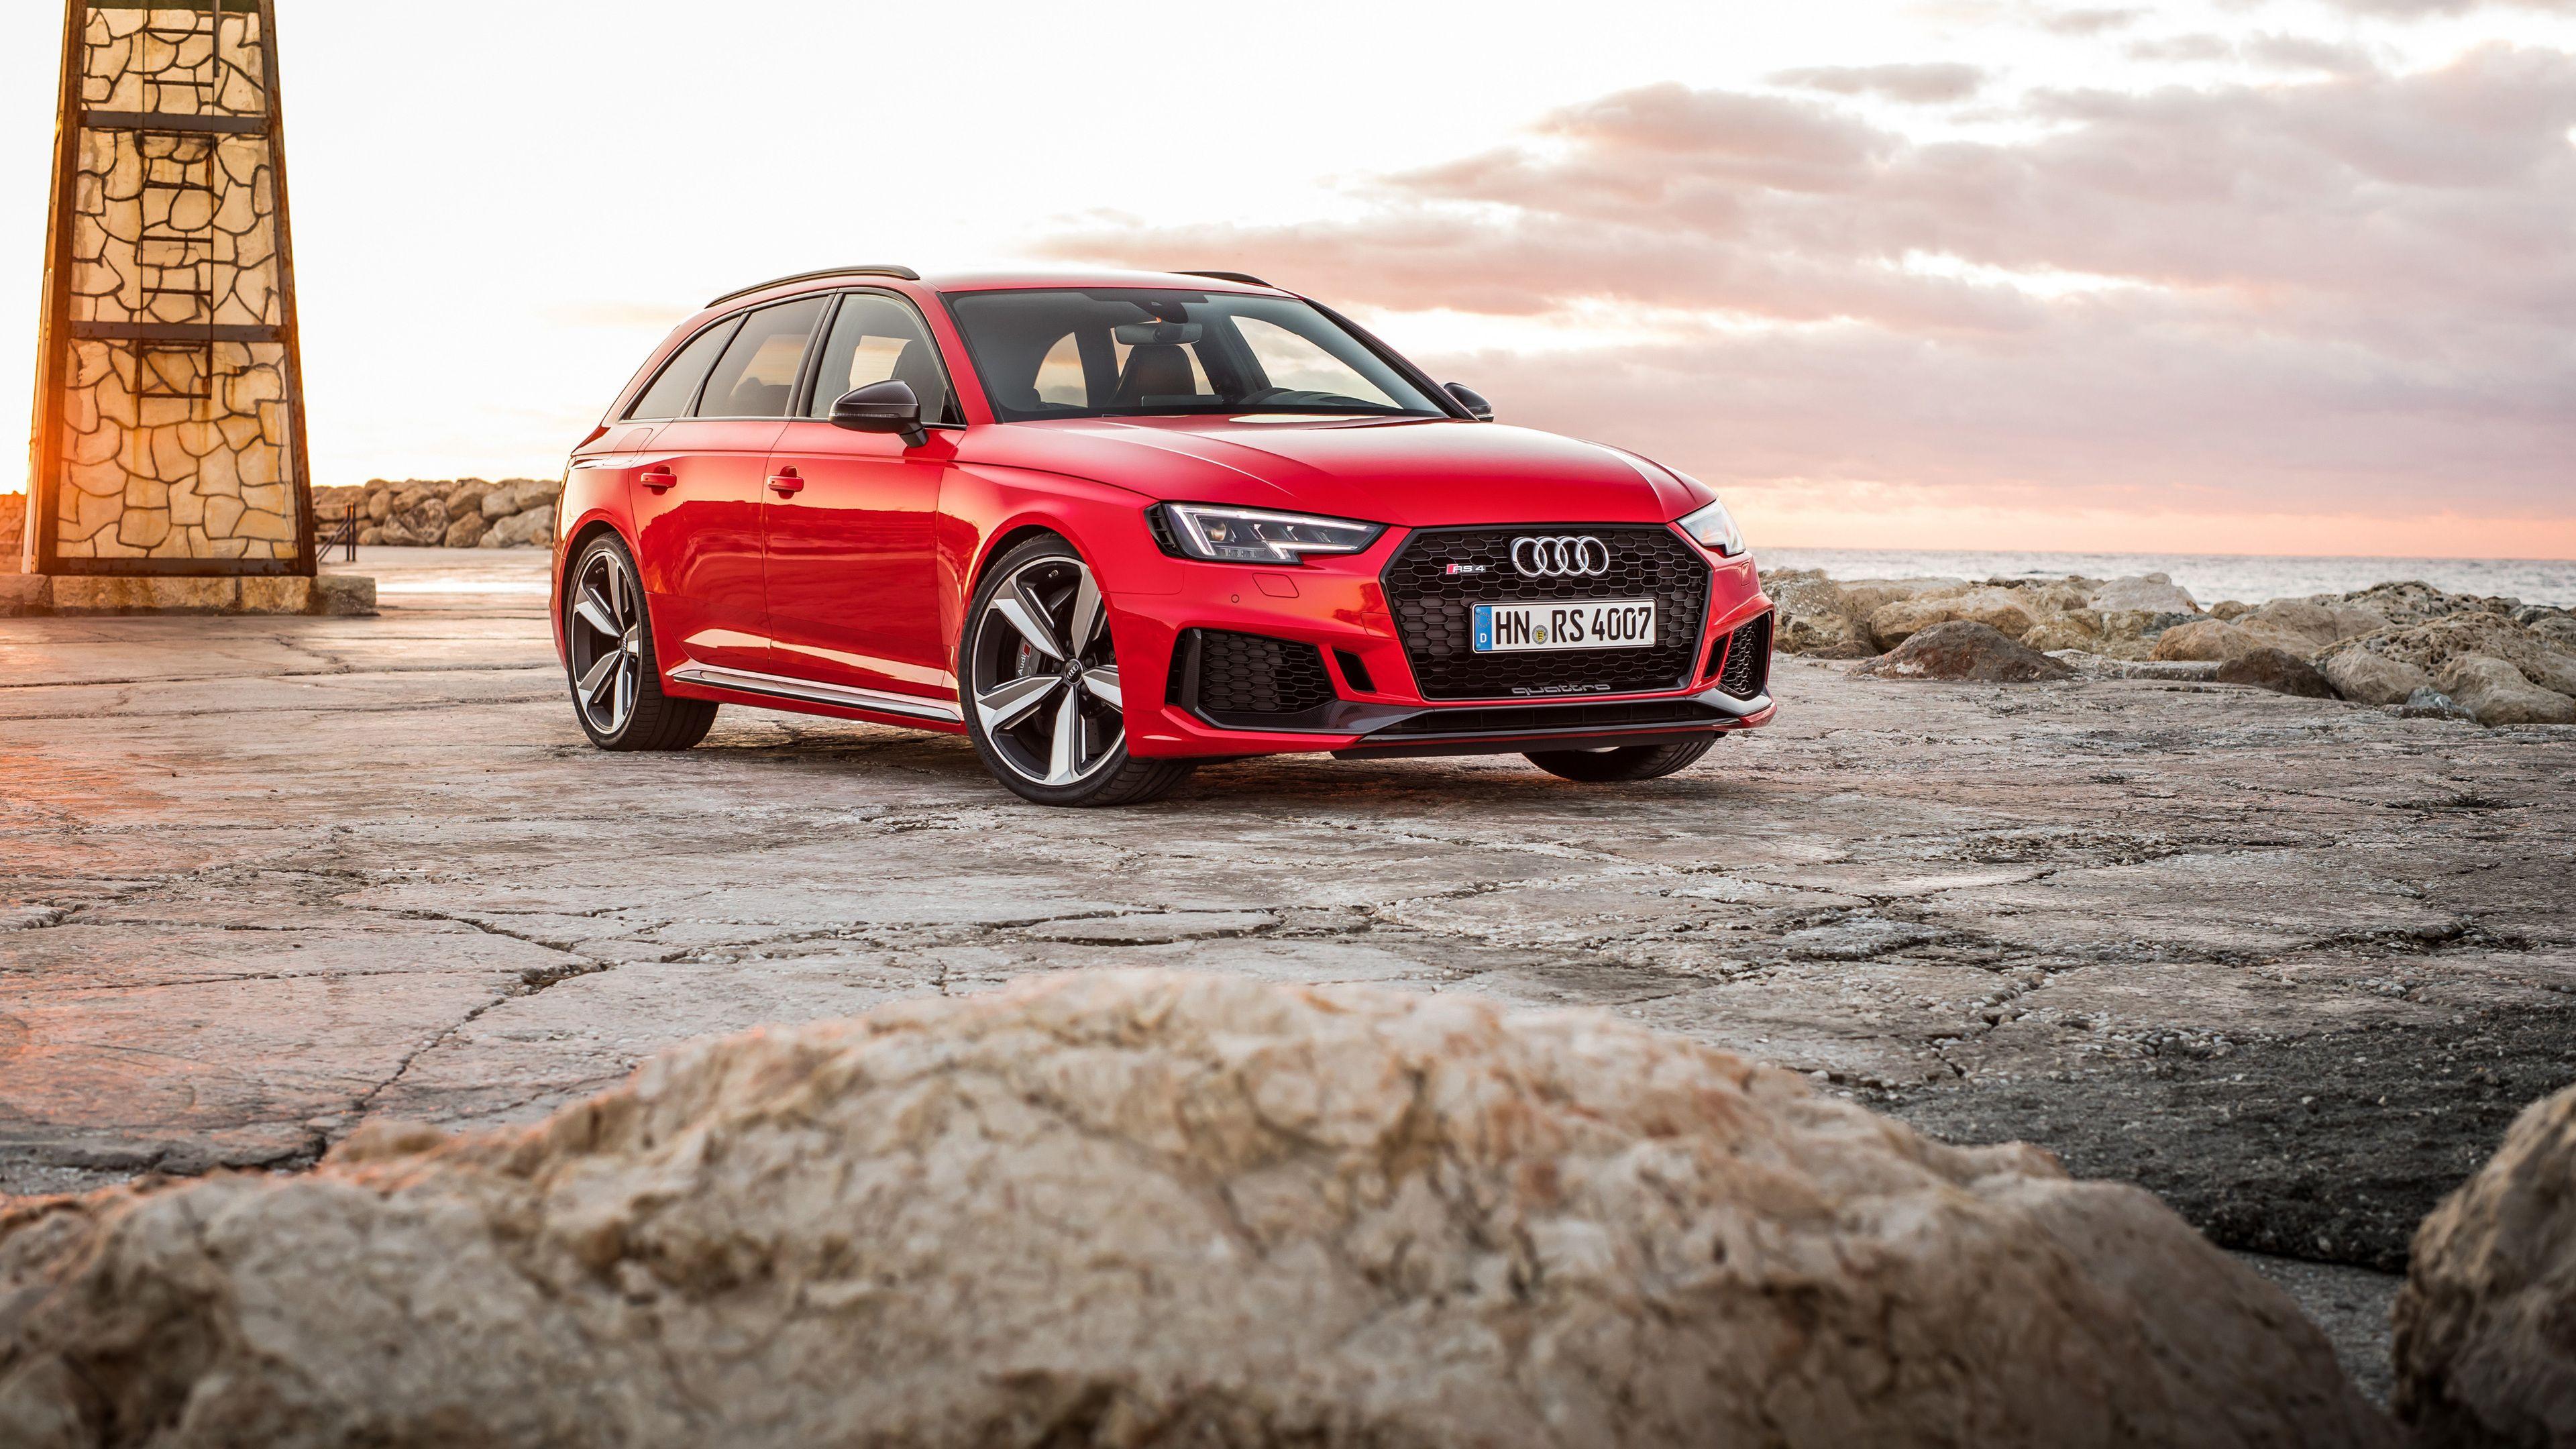 Audi Rs 4 Avant 2017 Hd Wallpapers Cars Wallpapers Audi Wallpapers Audi Rs 4 Avant Wallpapers 4k Wallpapers 2017 Cars Wall Audi Rs4 Audi Rs Red Sports Car